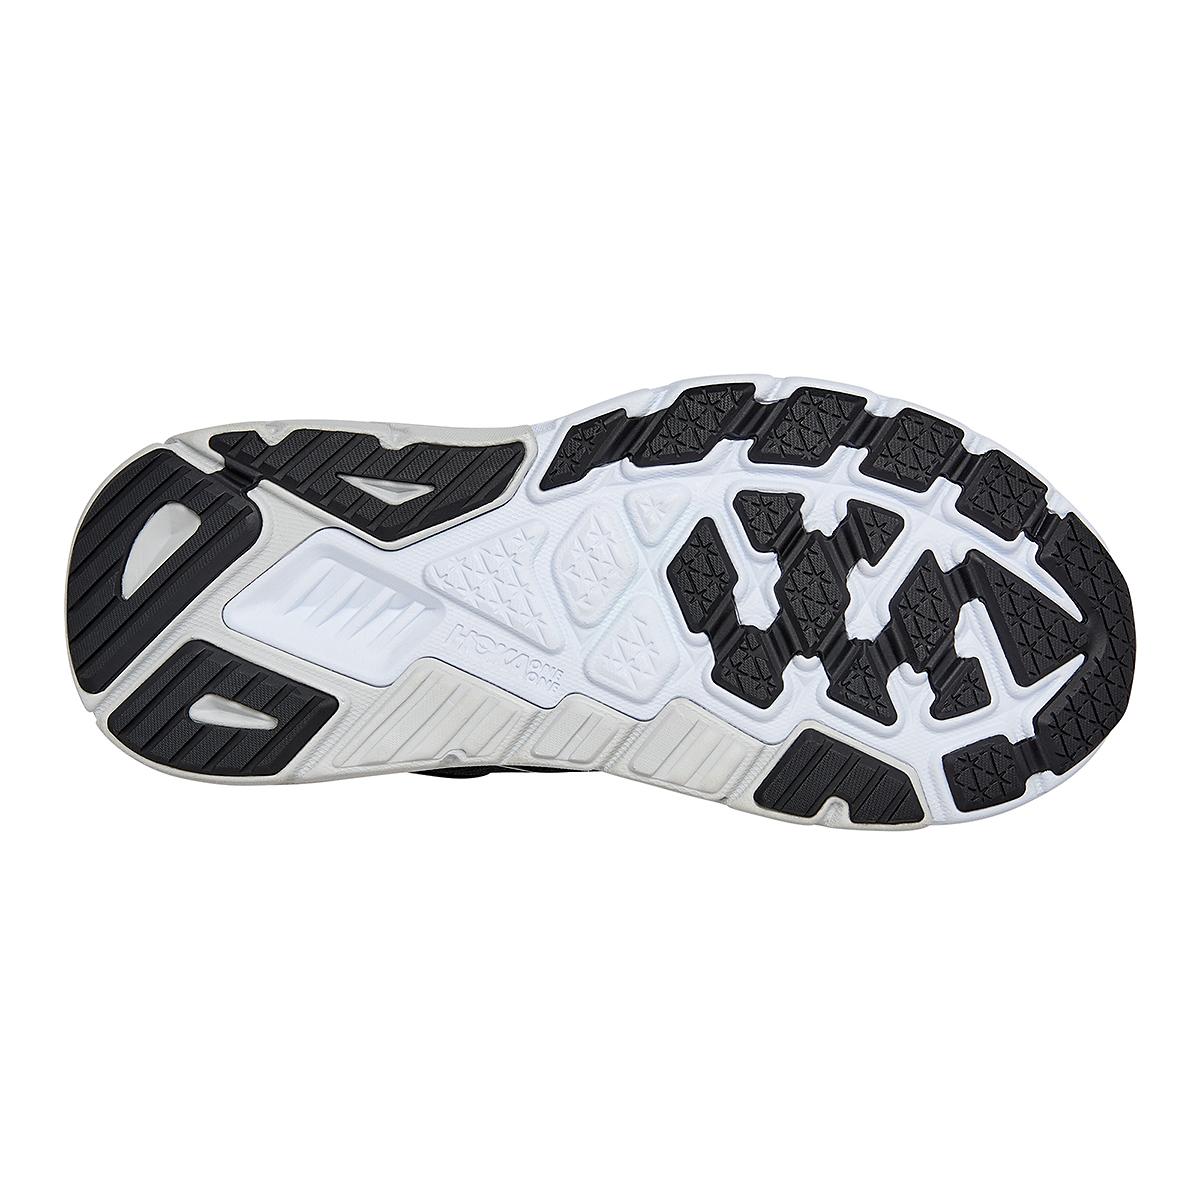 Women's Hoka One One Arahi 5 Running Shoe - Color: Black/White - Size: 5 - Width: Regular, Black/White, large, image 6